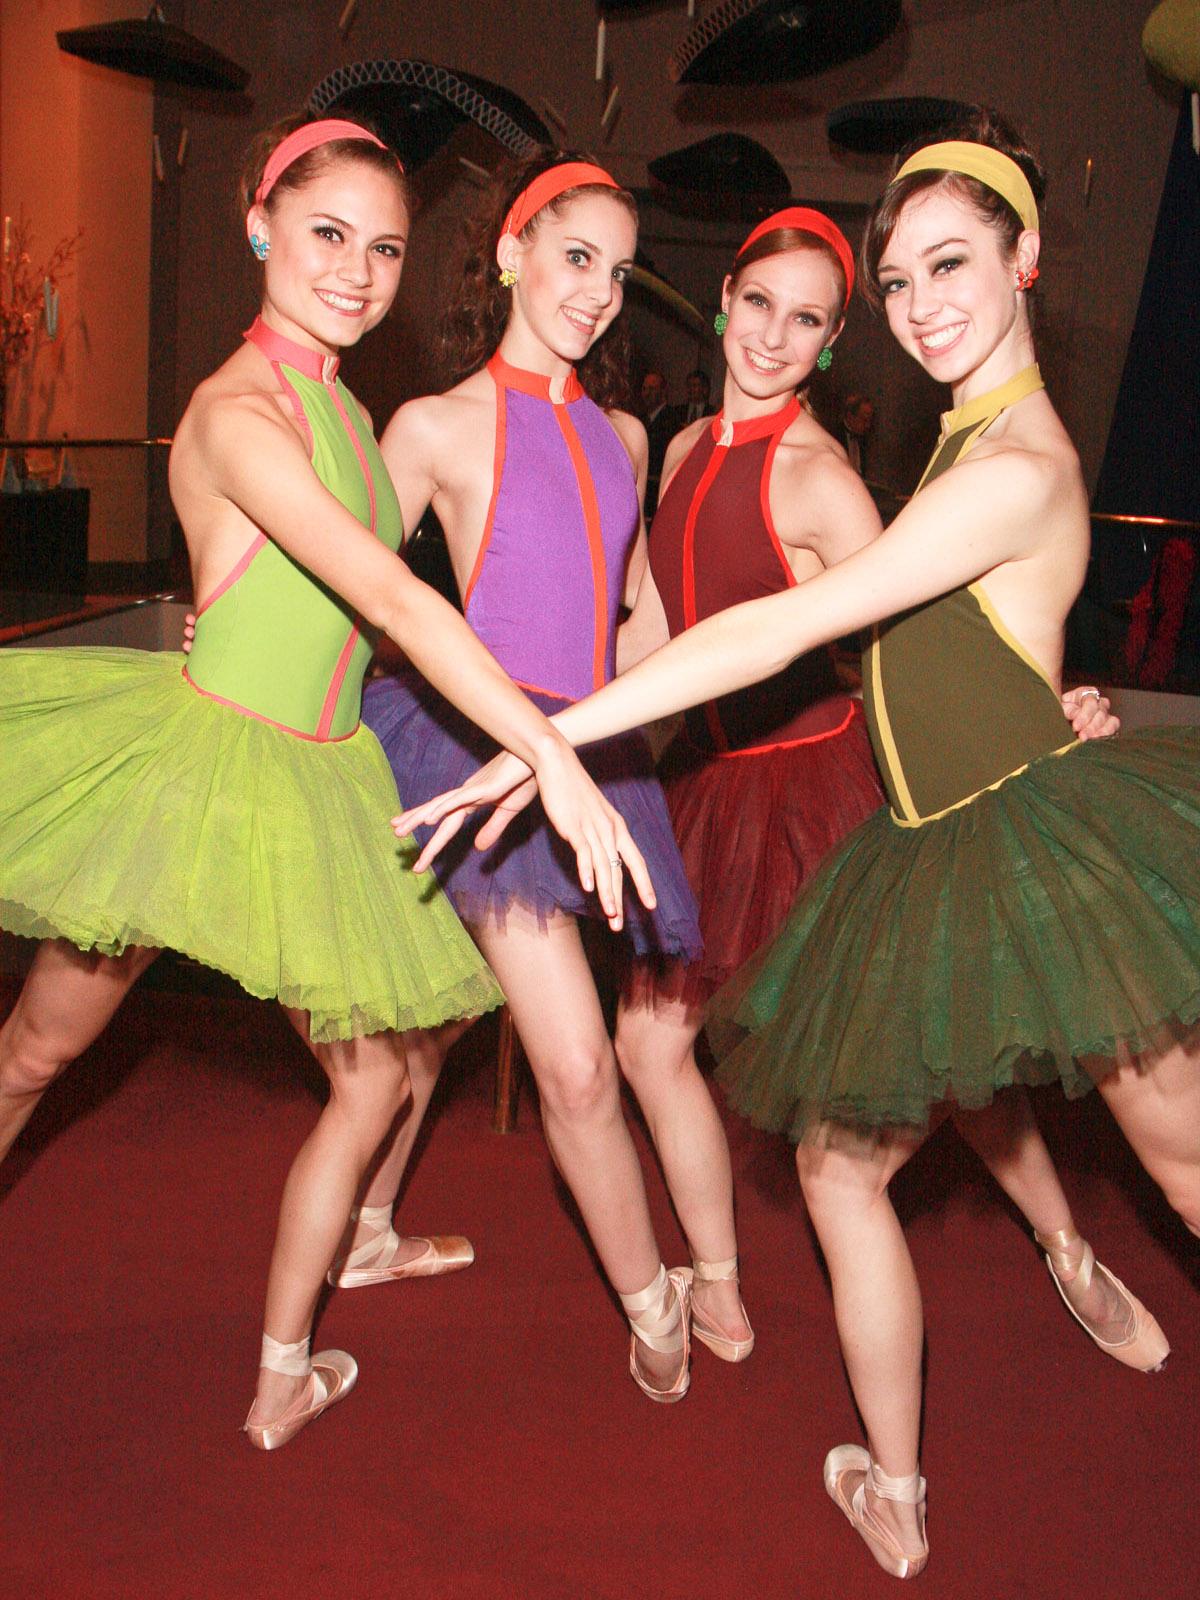 News_Ballet Ball_Feb. 2010_Houston Ballet II_dancers_036